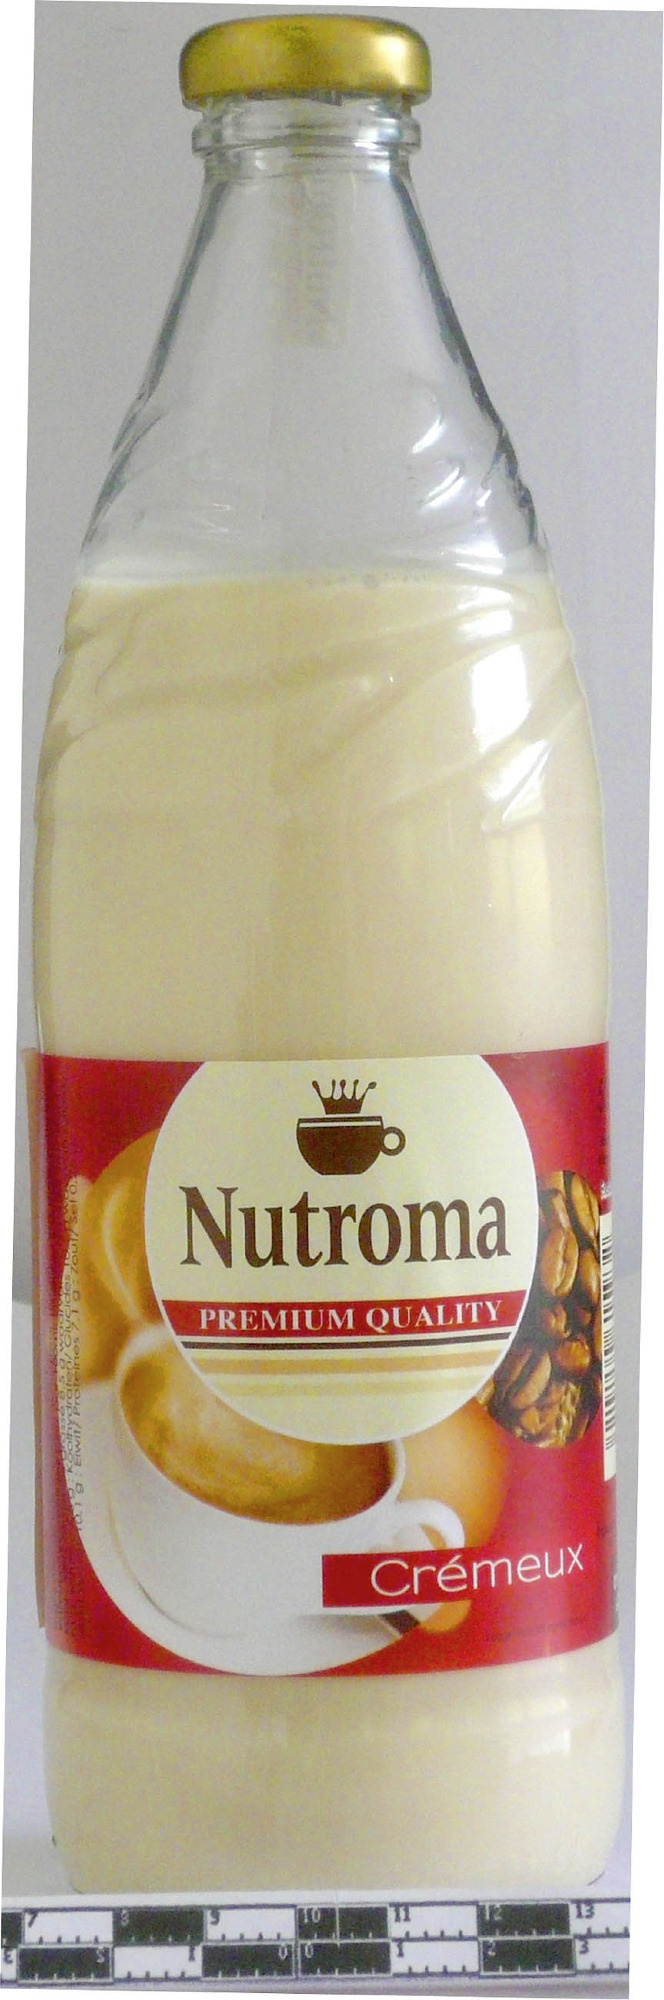 Nutroma - Product